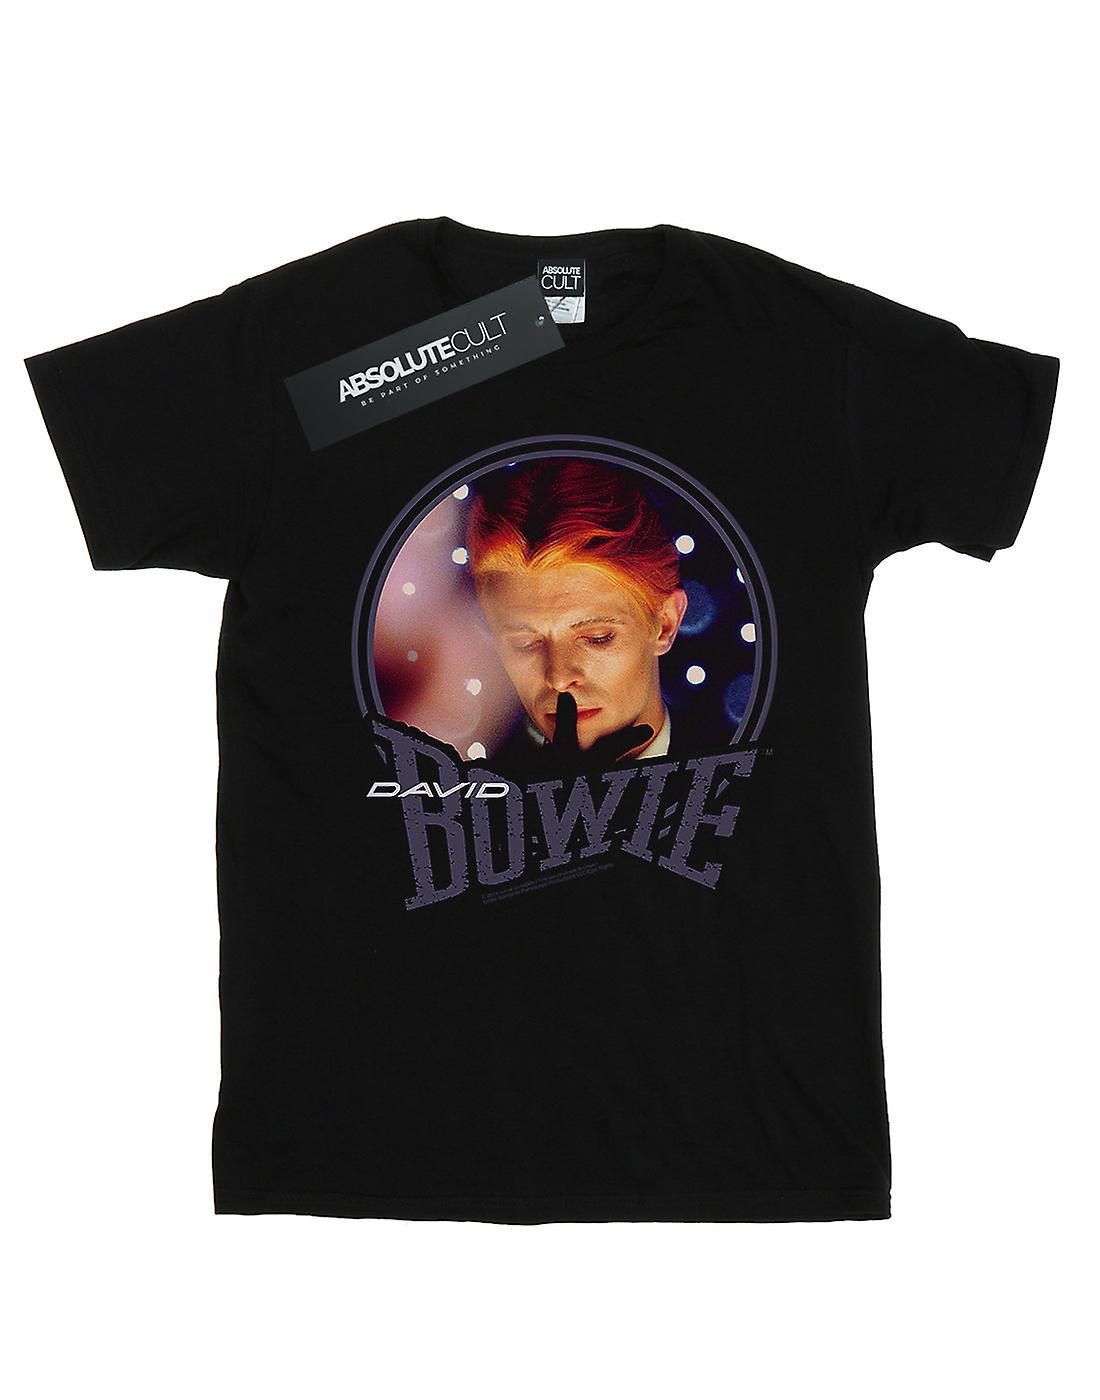 David Bowie Men's Quiet Lights T-Shirt